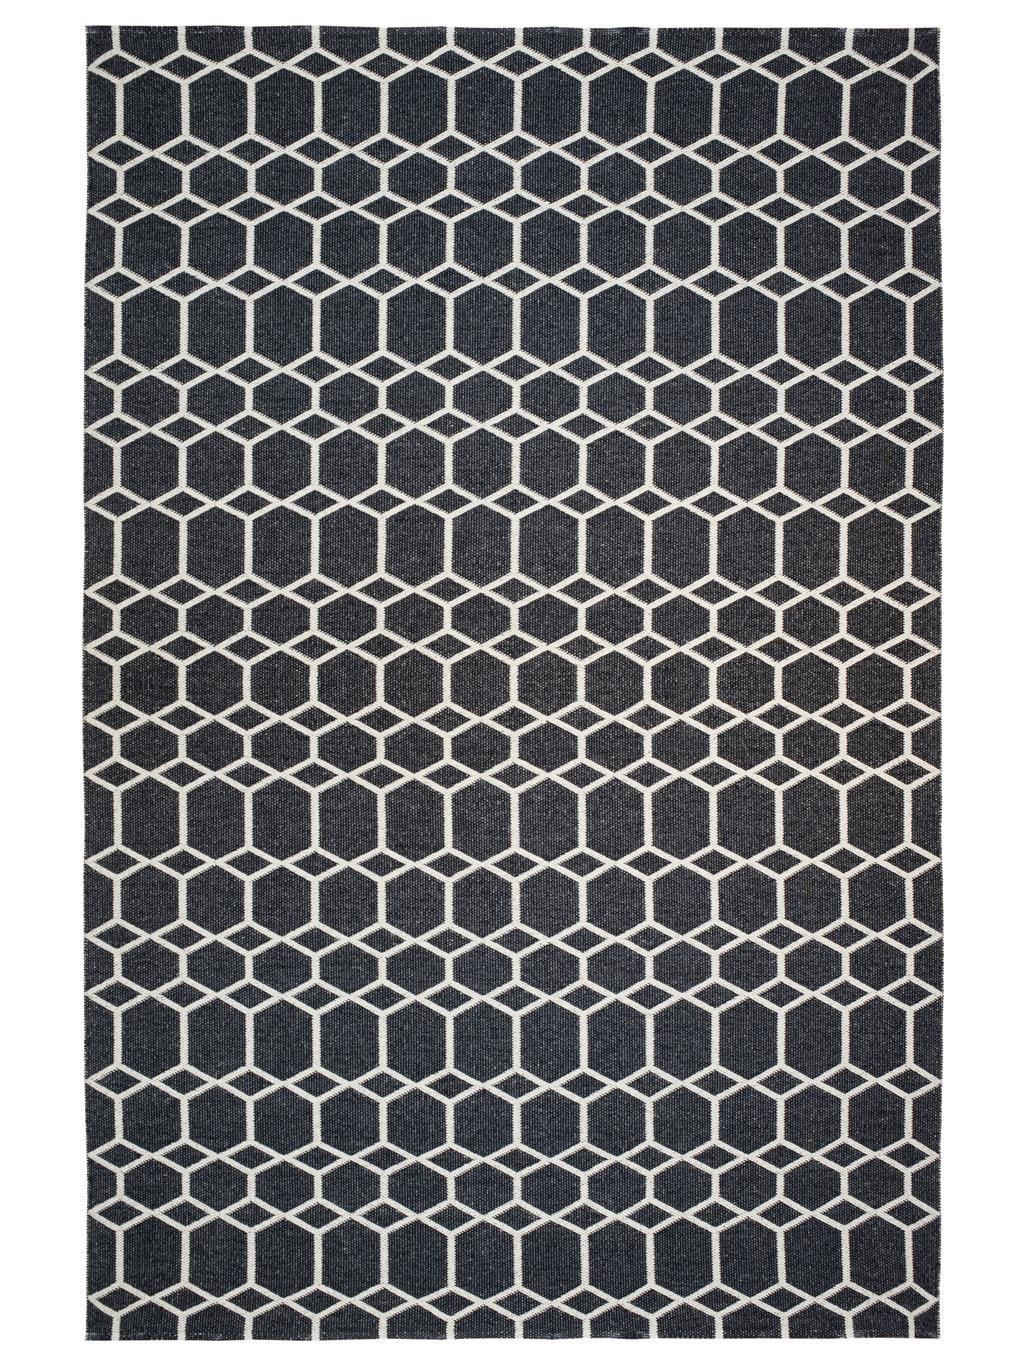 klare sache der kunststoff outdoor teppich ingrid benuta teppich skandi interior rug. Black Bedroom Furniture Sets. Home Design Ideas